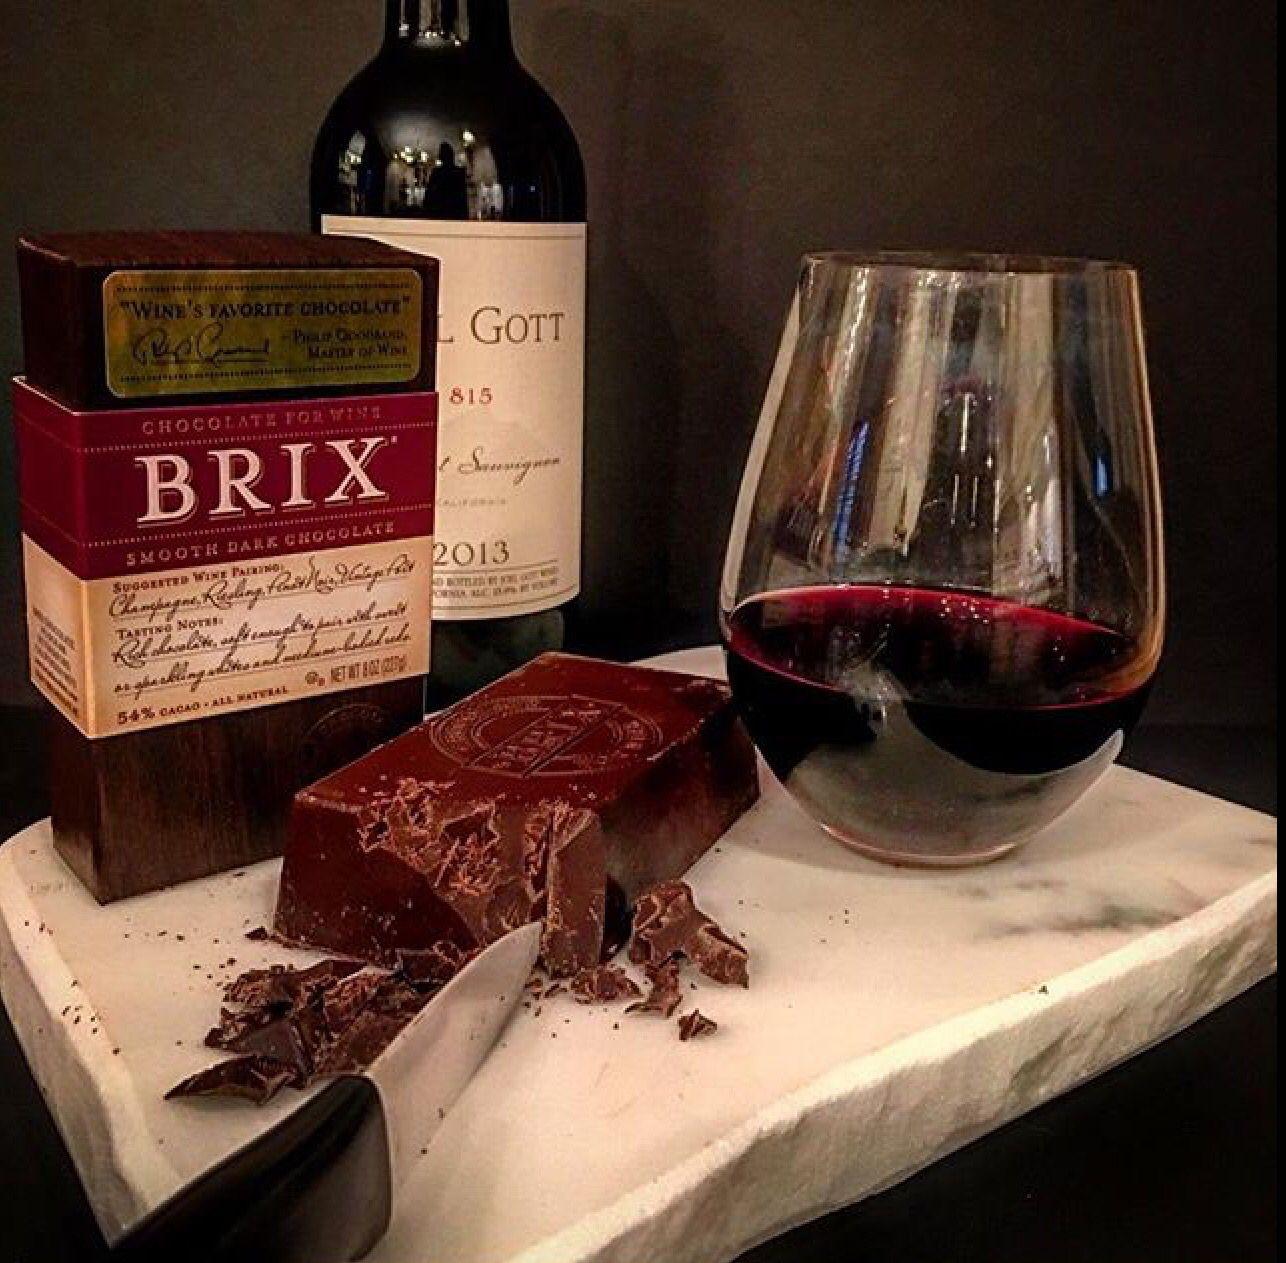 Brix Chocolate And Joel Gott Wine On An Irvingstone Entertaining Slab Wine Pairings Entertaining Dessert Fun Wine Pairing Wines Food